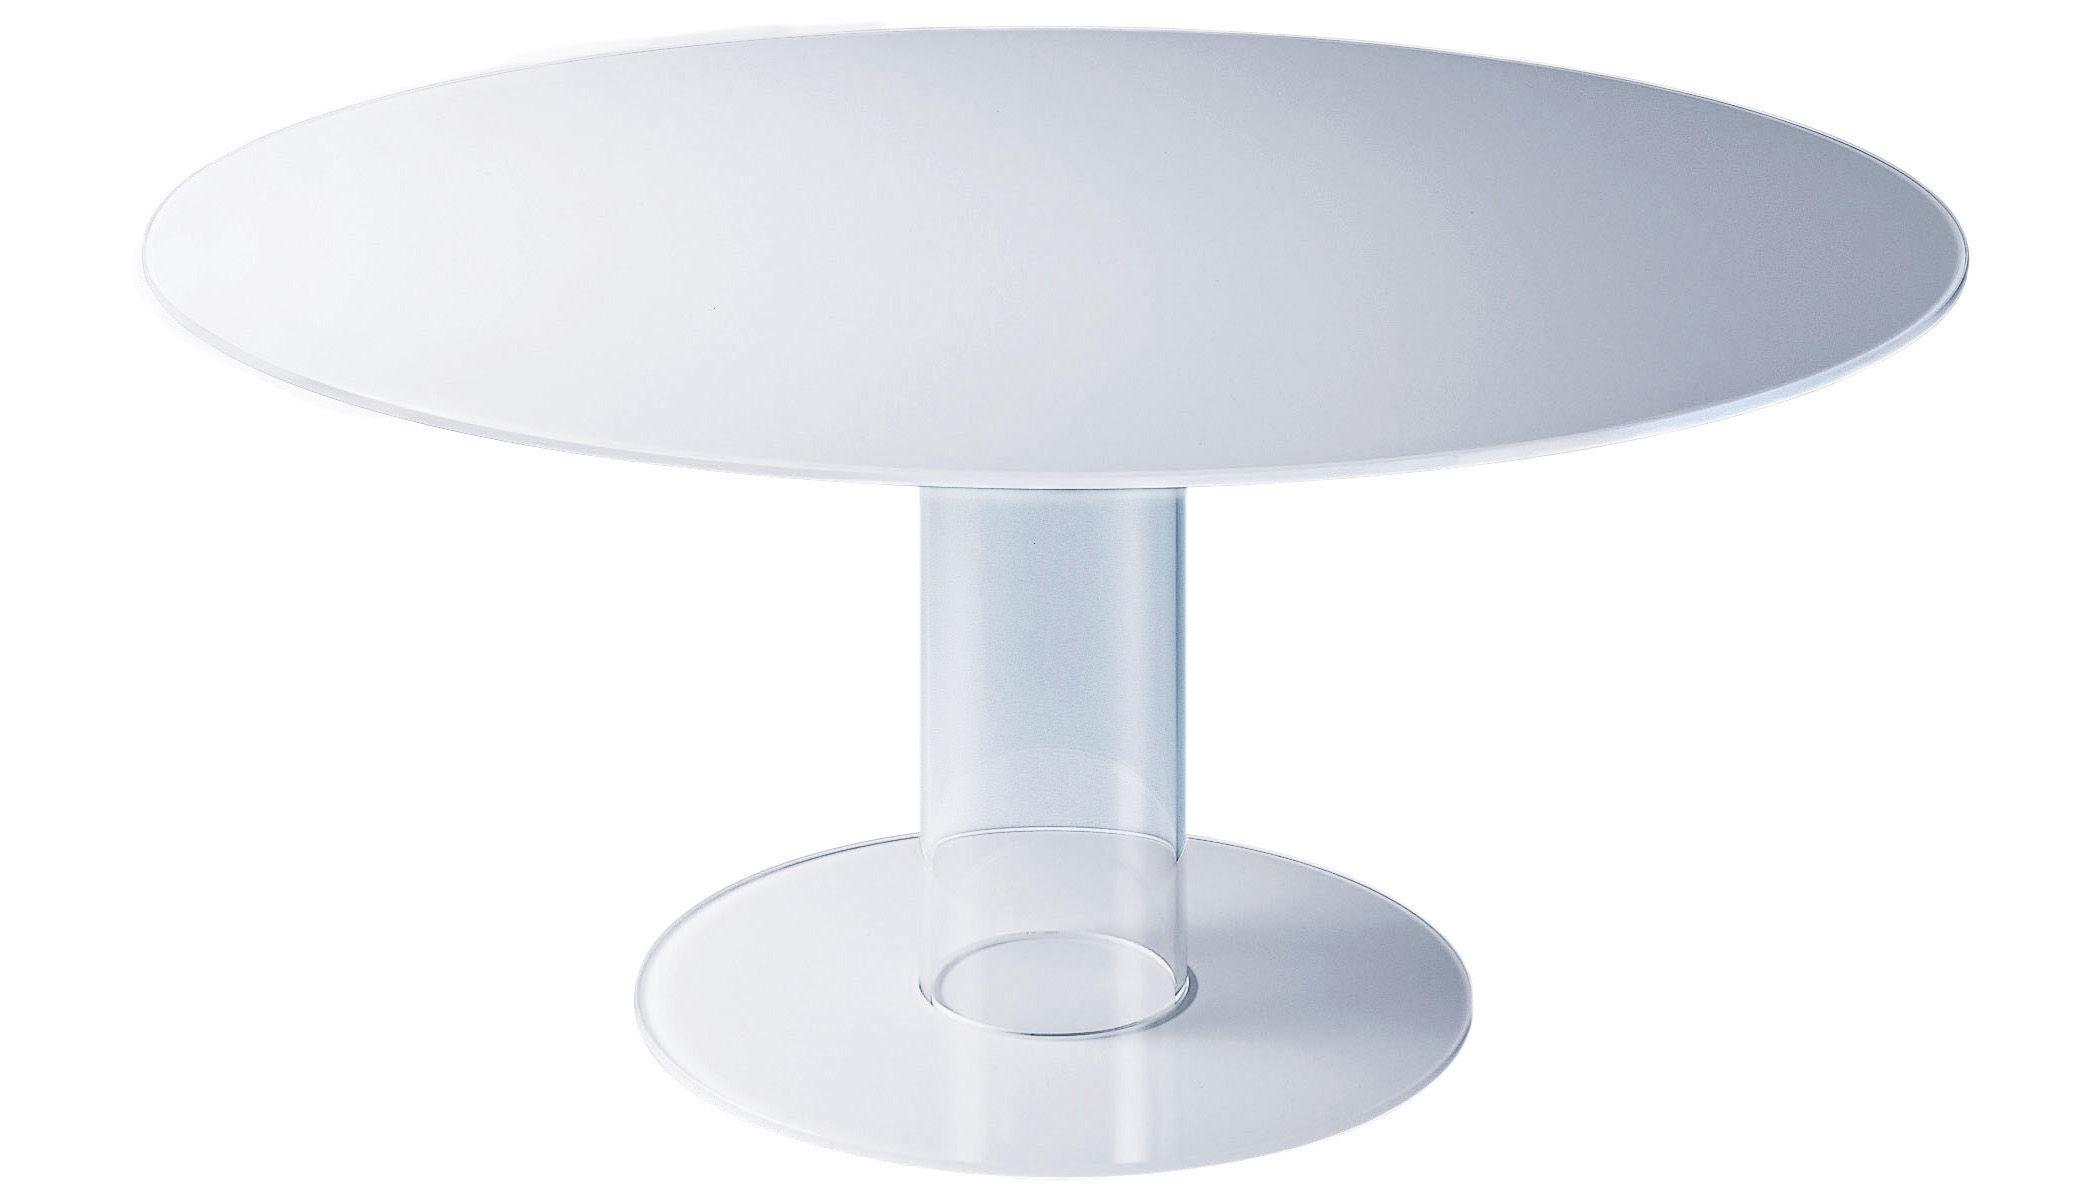 Mobilier - Tables - Table ronde Hub / Ø 140 cm - Glas Italia - Blanc - Ø 140 cm - Verre